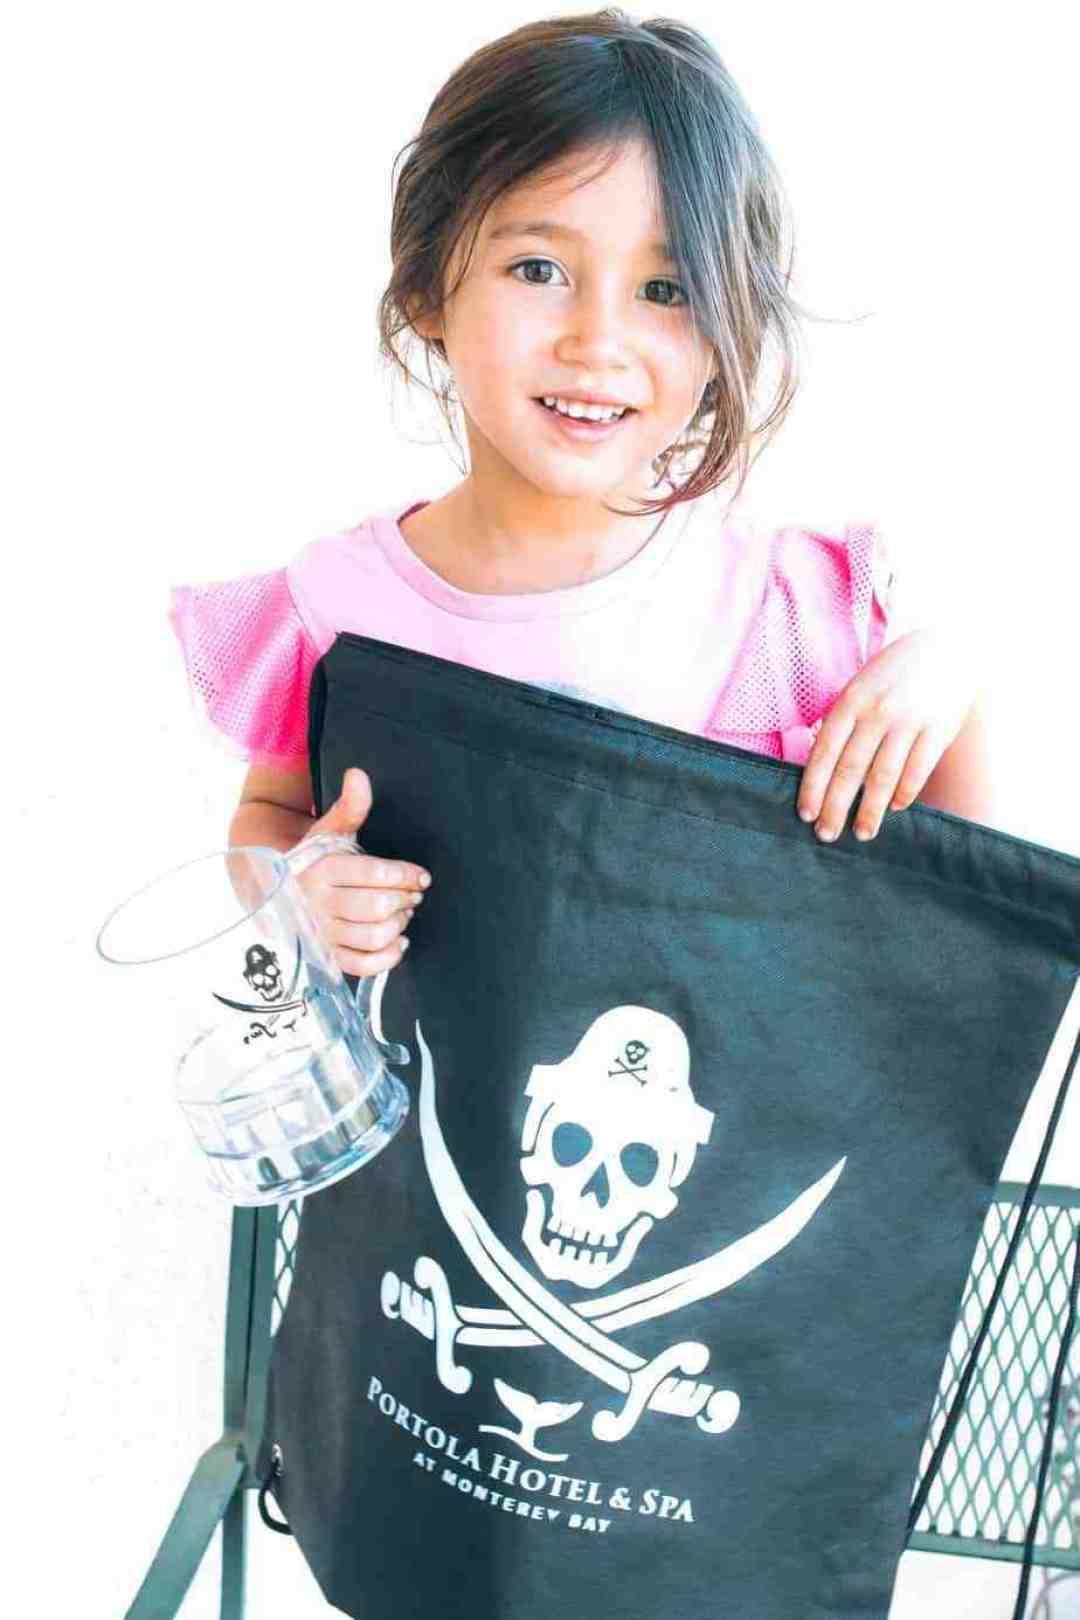 portola hotel and spa pirate program